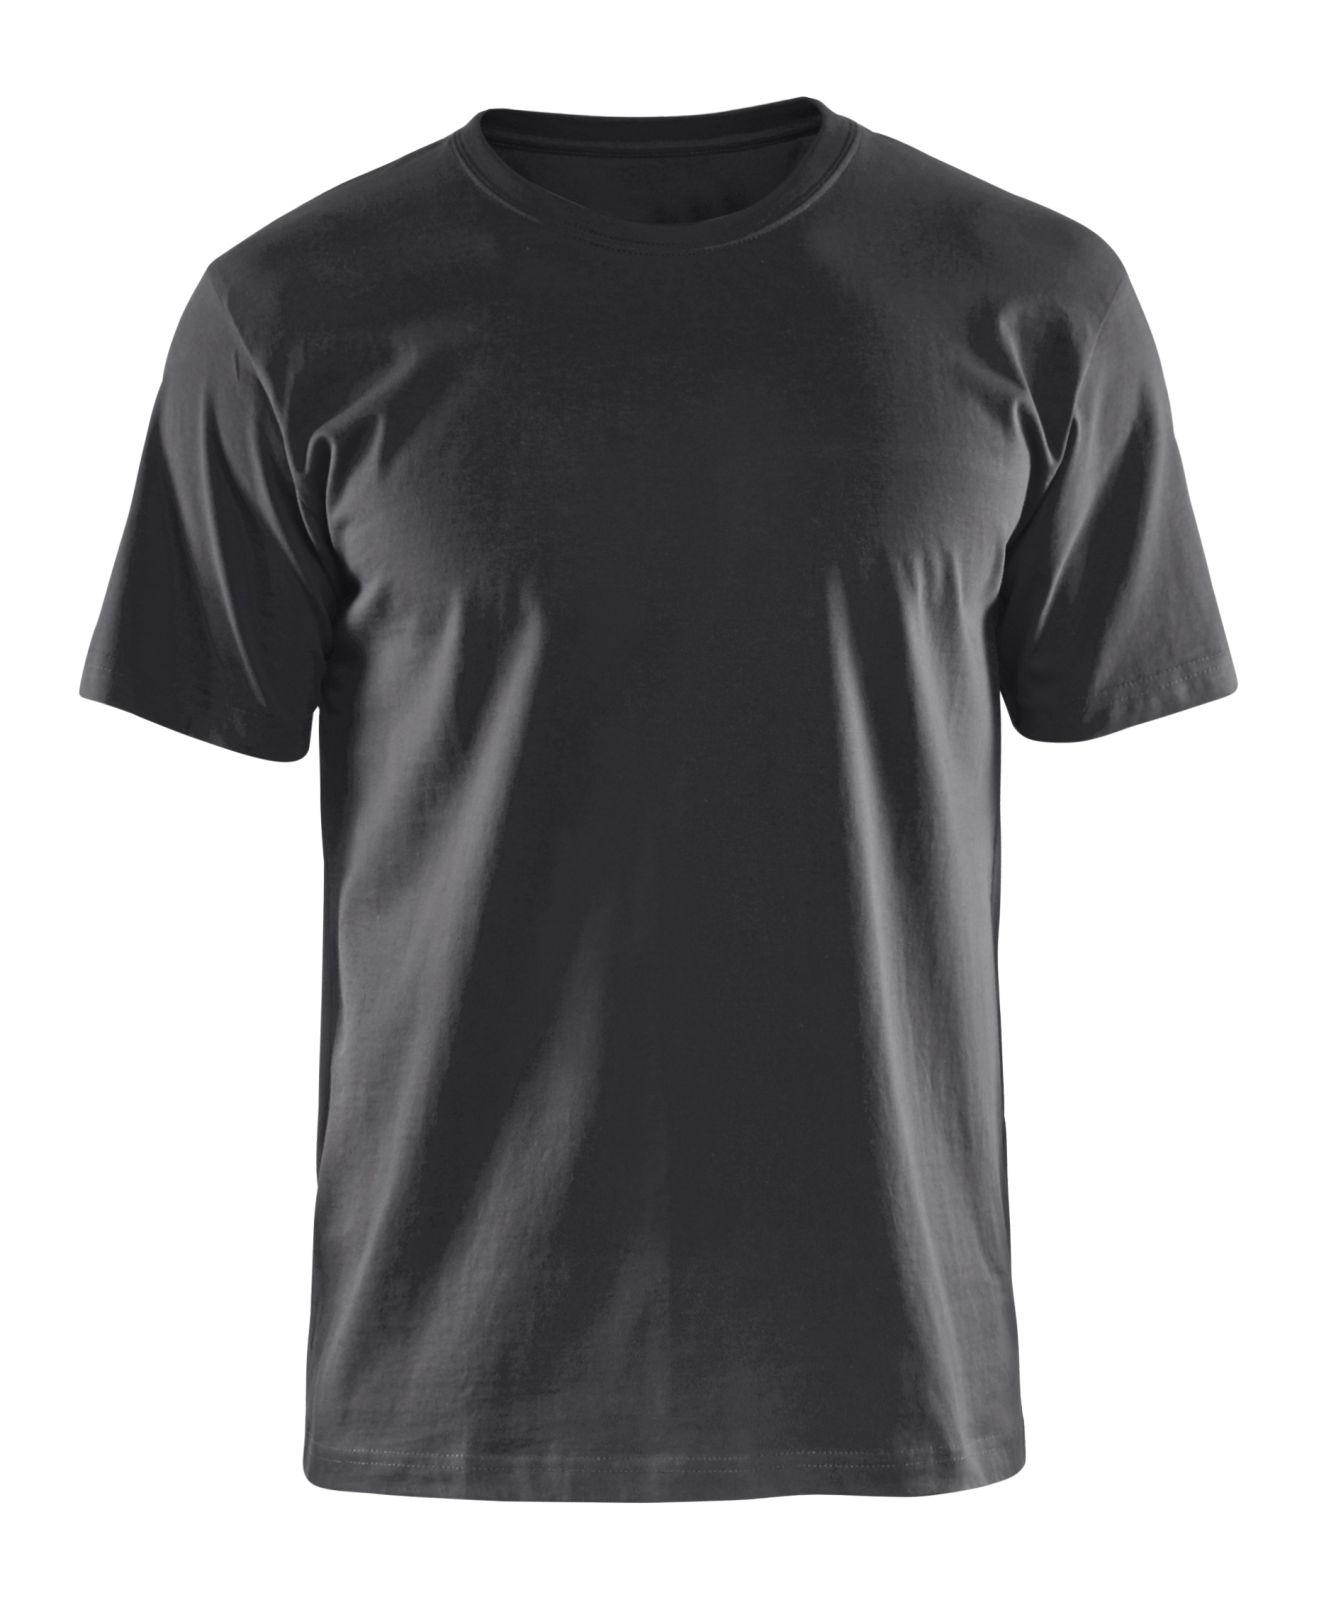 Blaklader T-shirts 35251042 midden grijs(9600)